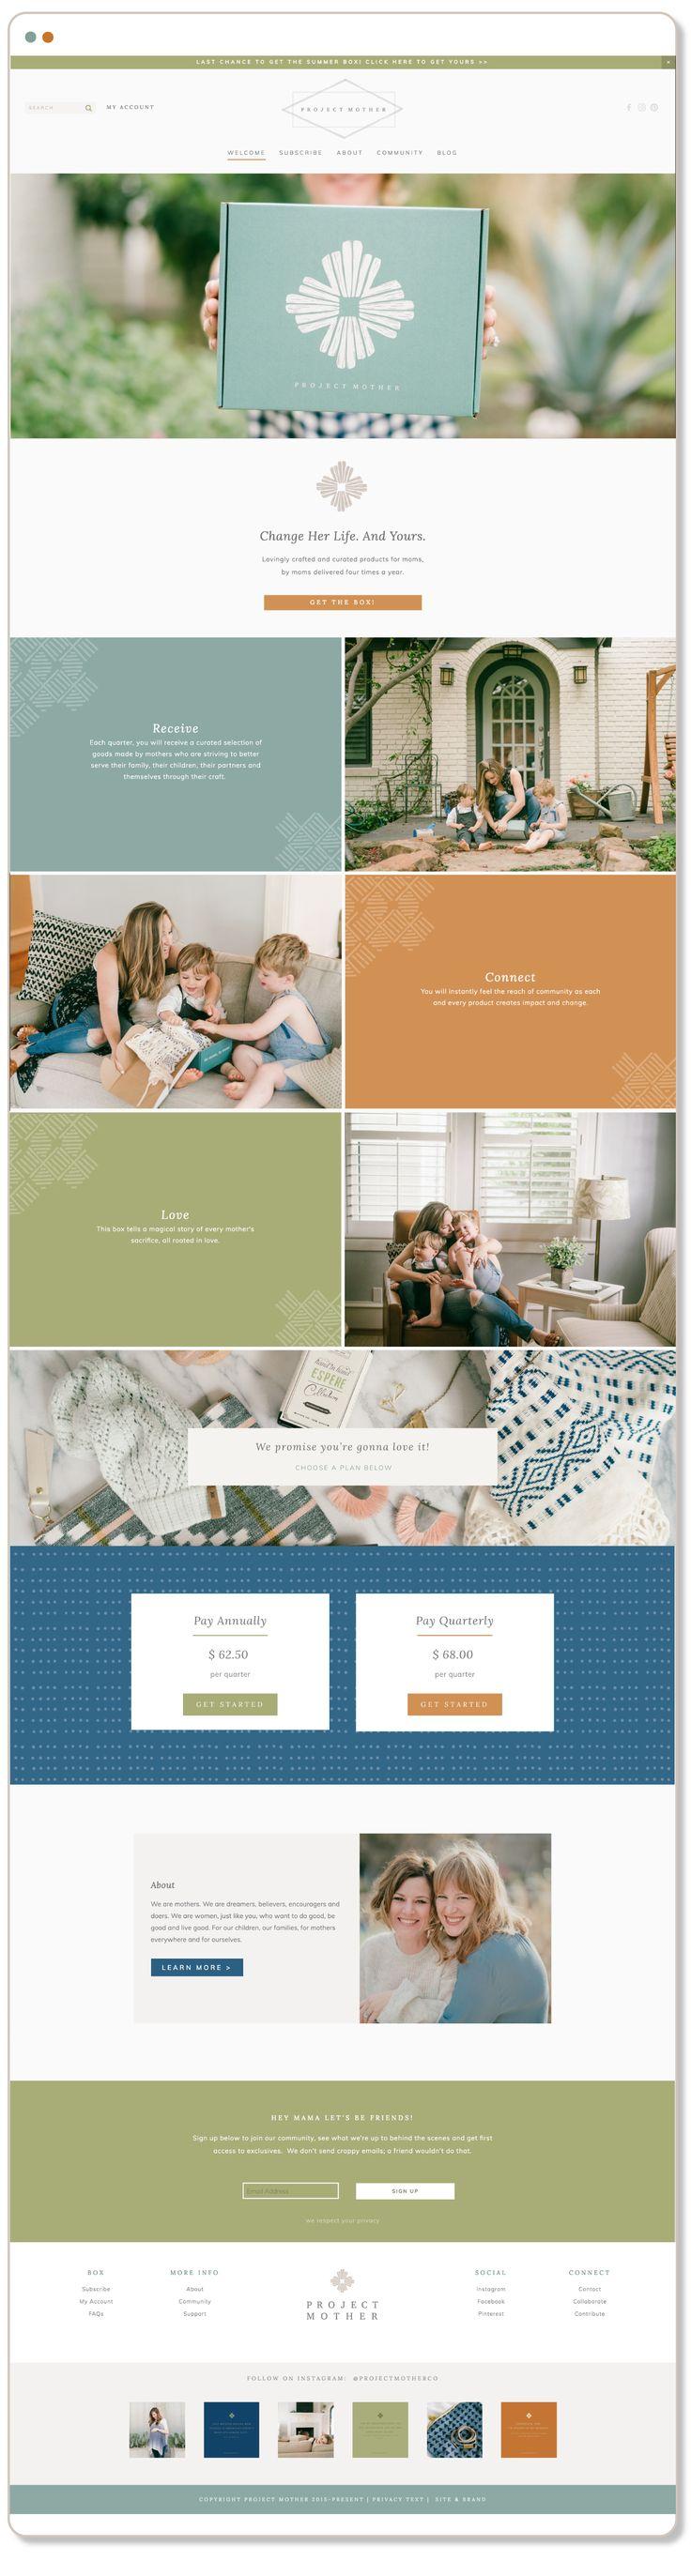 Project Mother Website by Meg Summerfield and Drop Cap Design.jpg